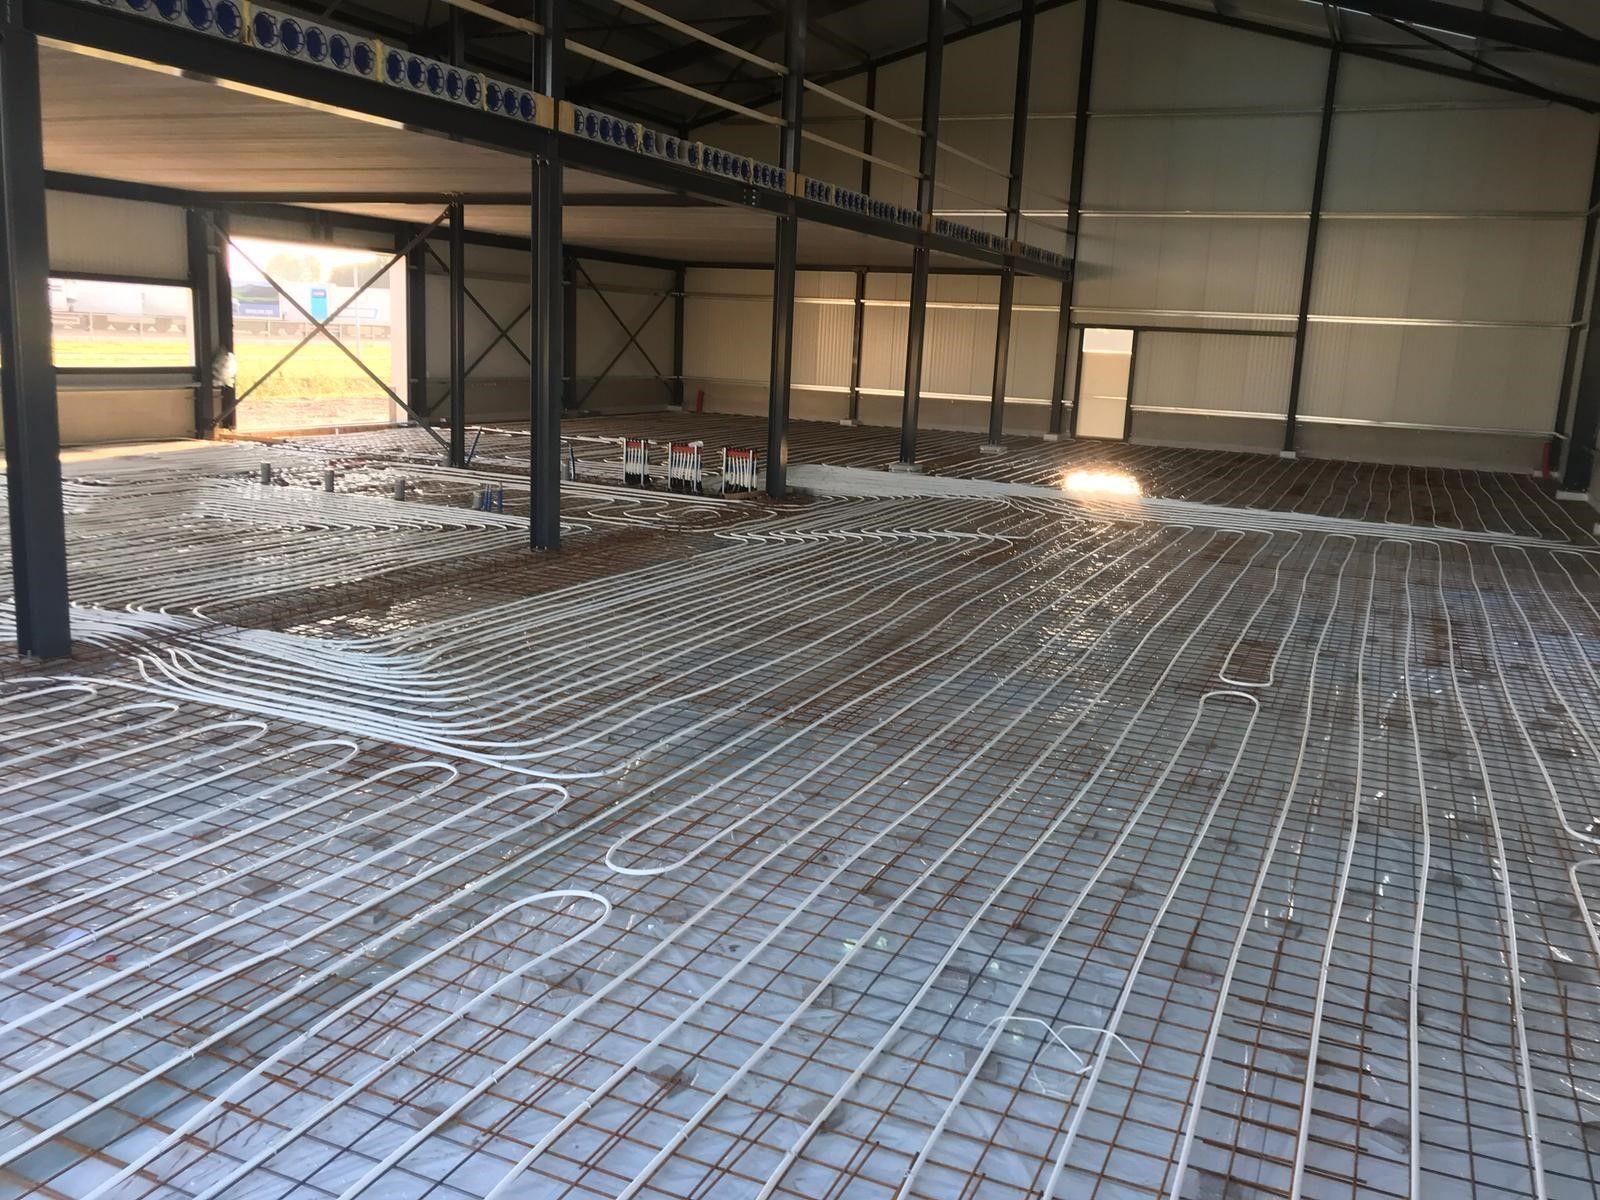 Van Veldhuisen Techniek - Vloerverwarmingsinstallatie in loods